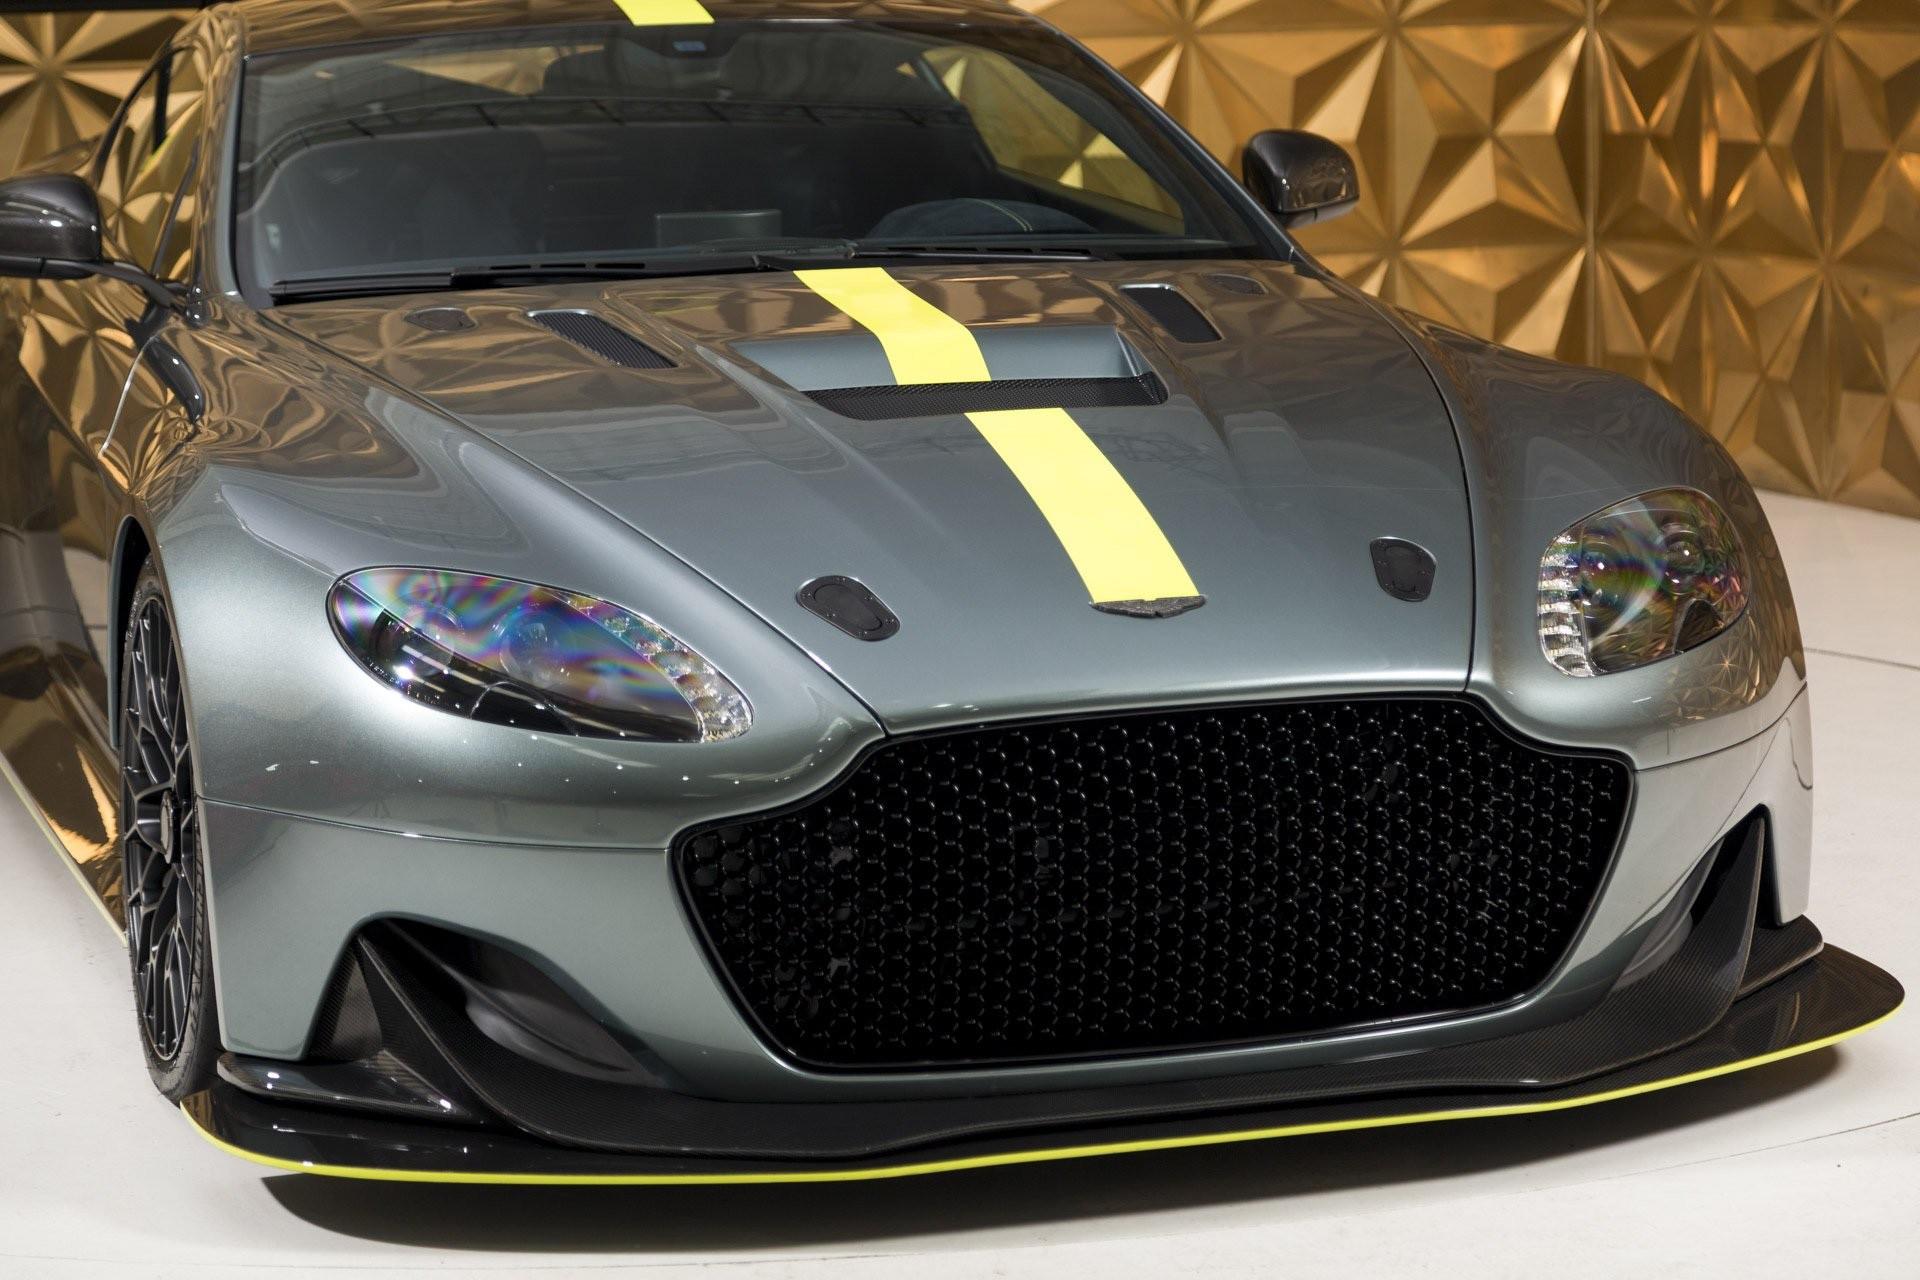 Aston_Martin_Vantage_AMR_Pro_sale-0006